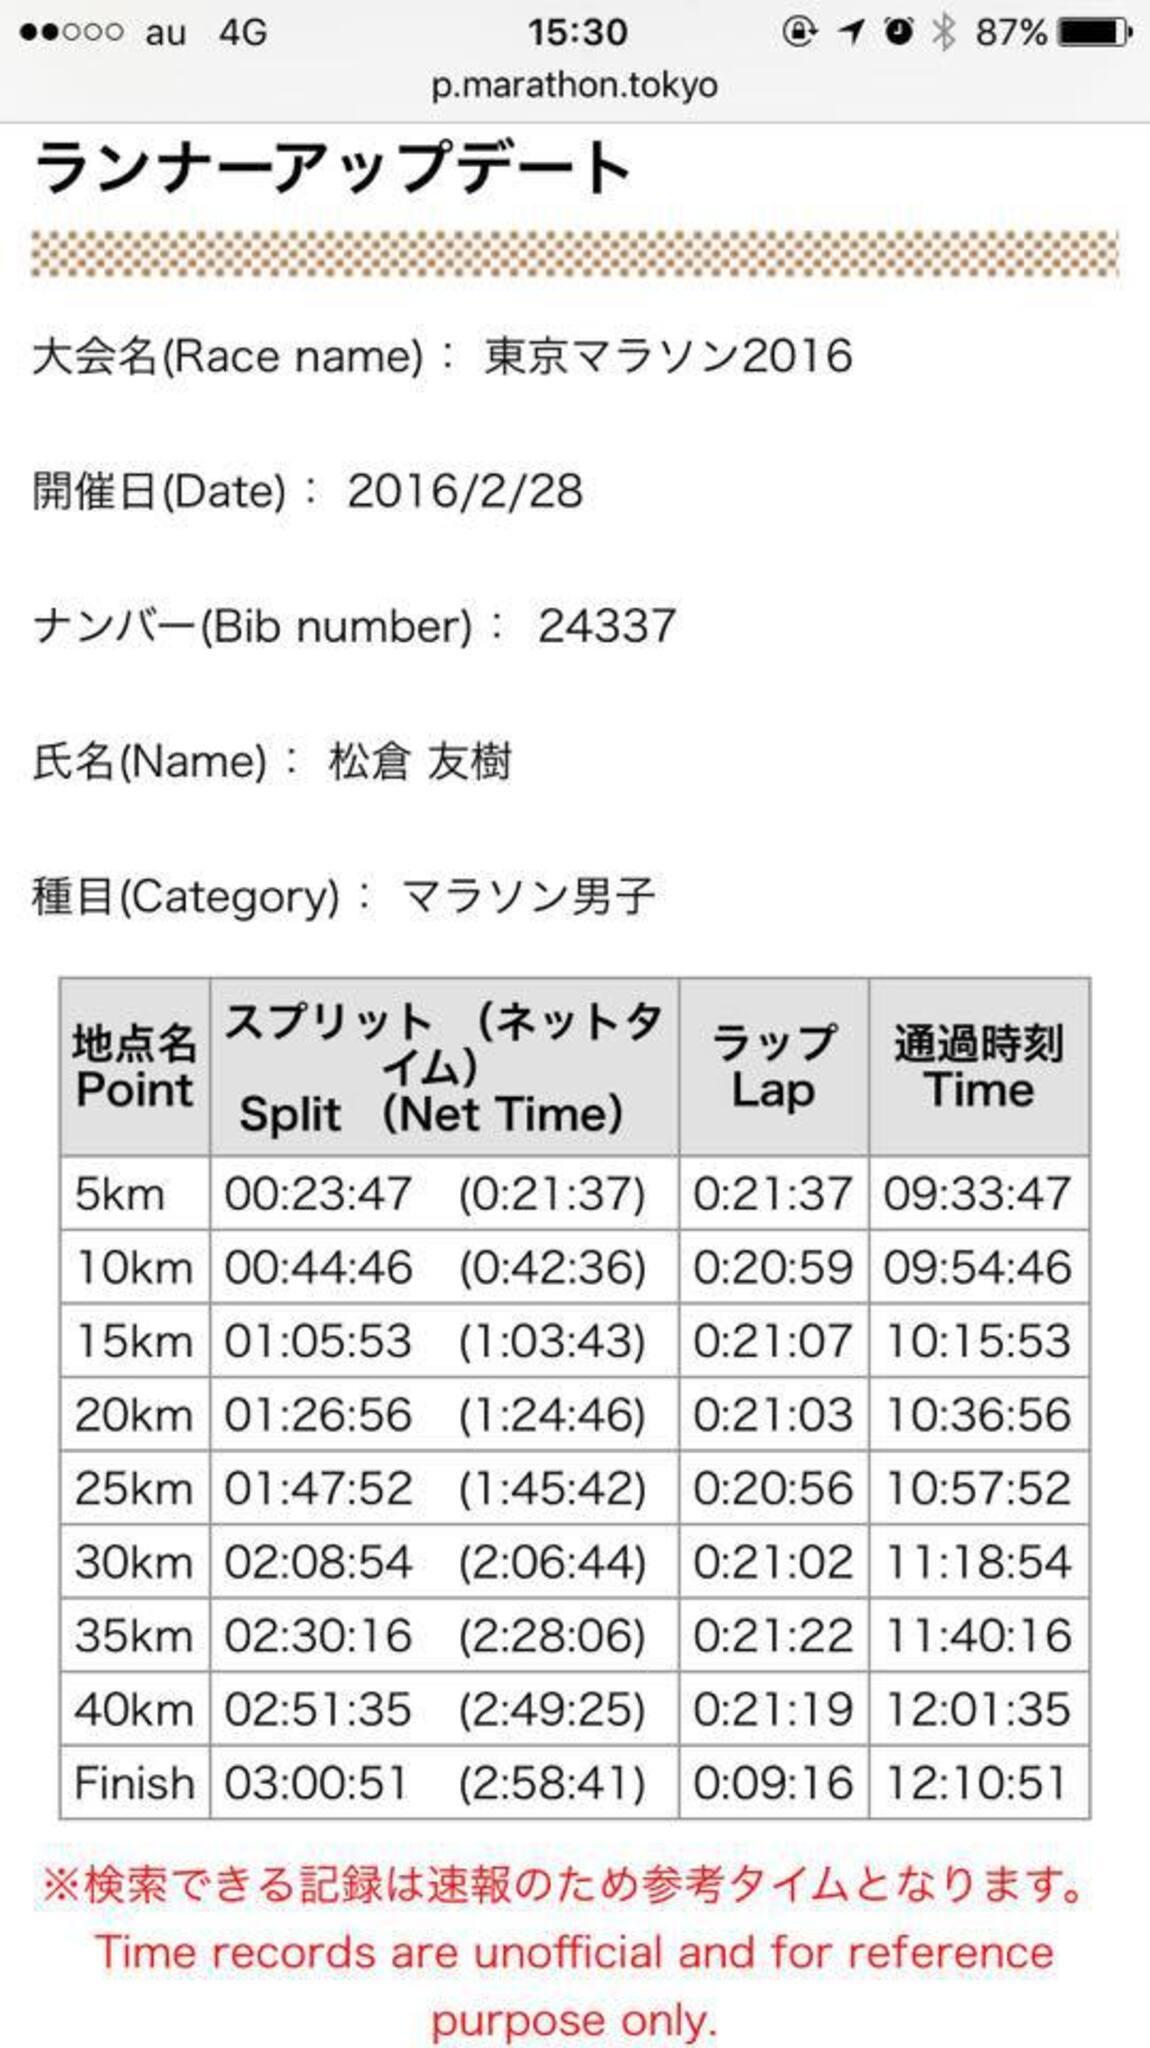 tokyo marathon 2016 lap